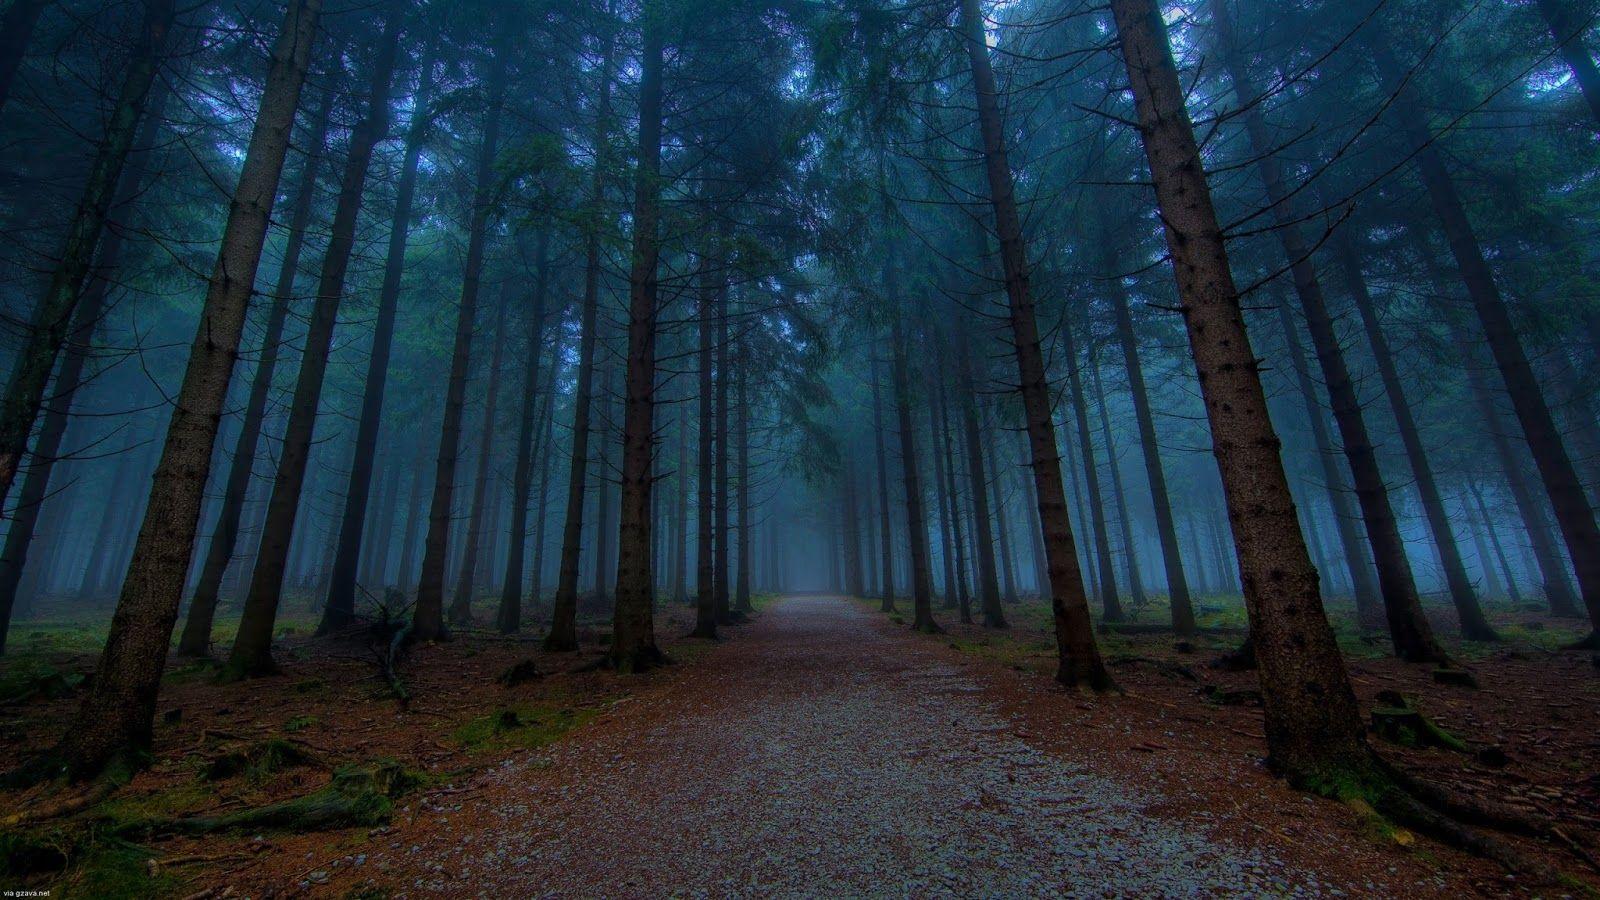 foggy forest wallpaper hd   1600 900 landscape